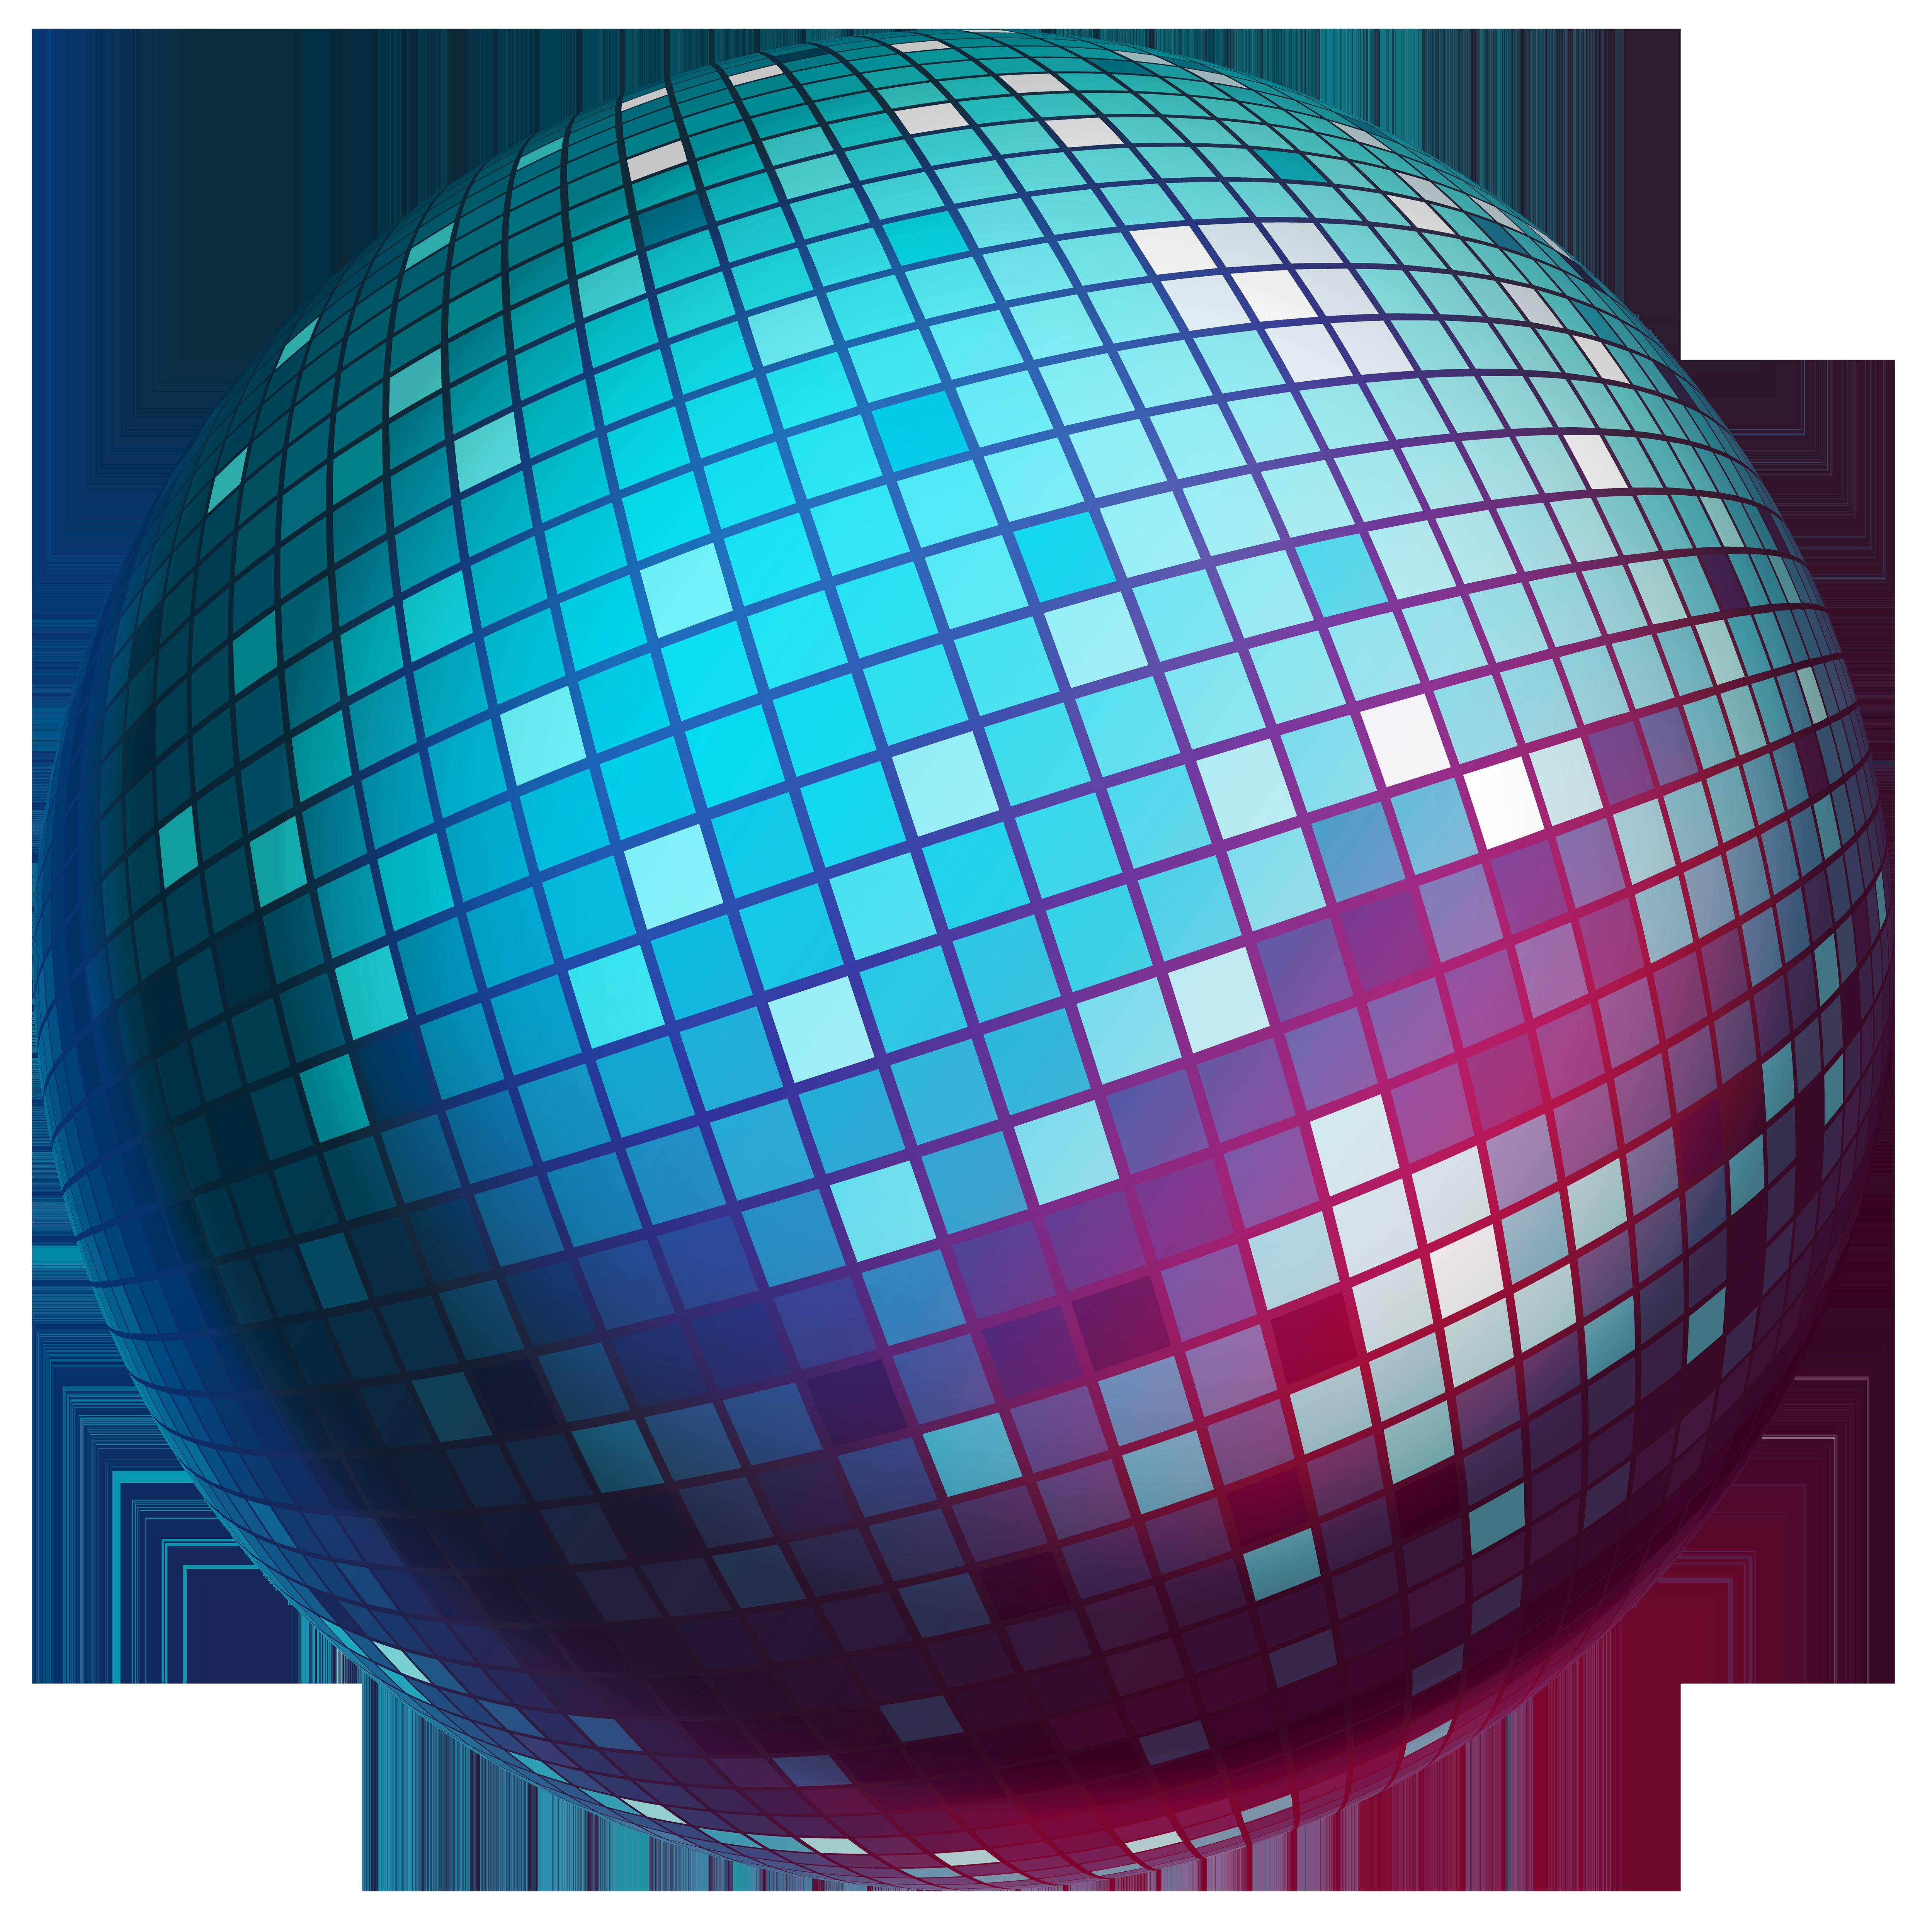 Disco Ball Transparent PNG Clip Art Image.